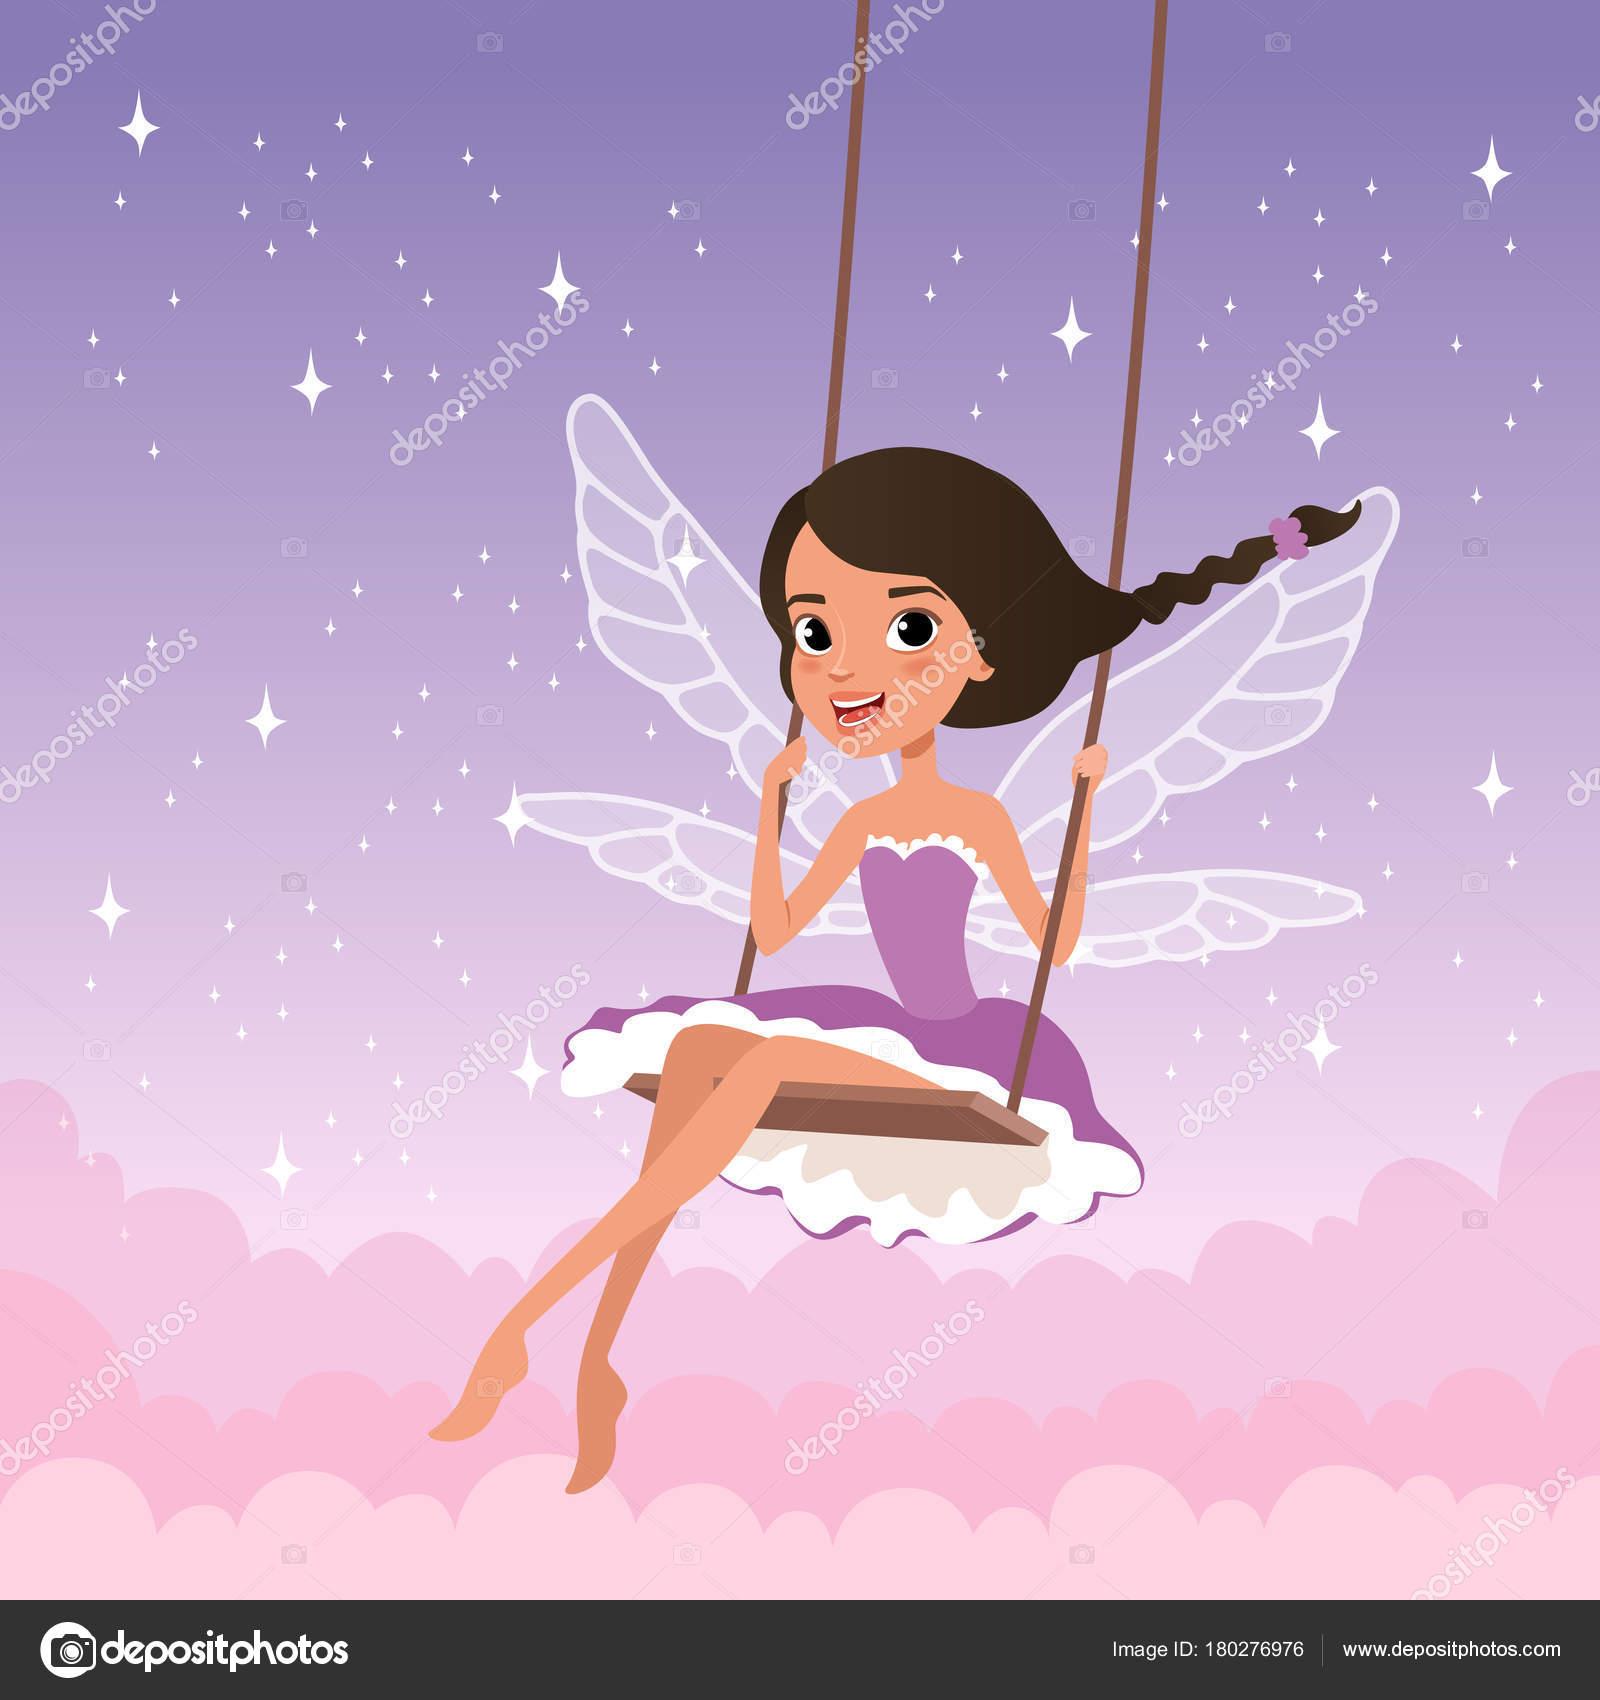 8fee70902 Cute fairy on swing. Magical creature from fairy tale. Cartoon girl ...